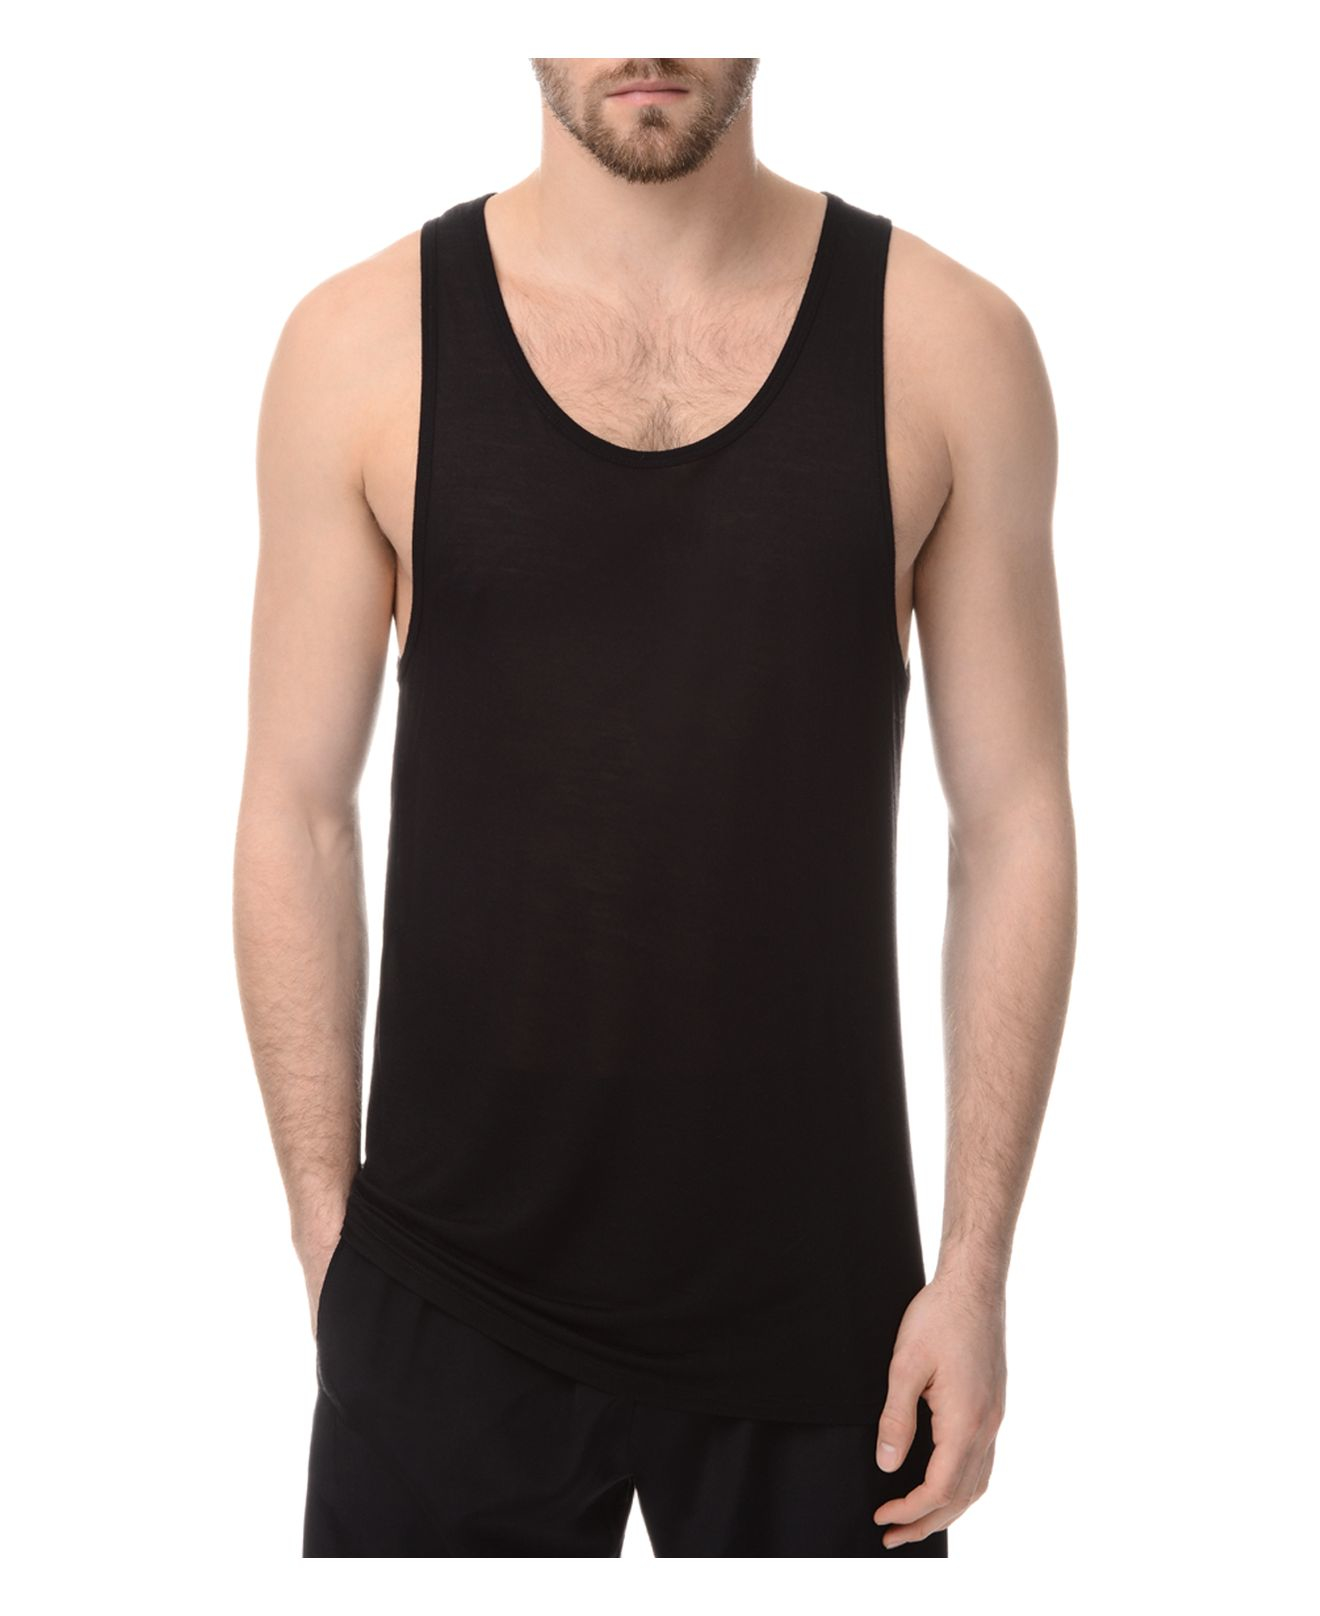 Slim Fit Cotton Fine Line Stripe Dress Shirt Slim Fit Cotton Fine Line Stripe Dress Free Exchanges· Simple Returns· Big & Tall Sizes· Quality Menswear2,+ followers on Twitter.